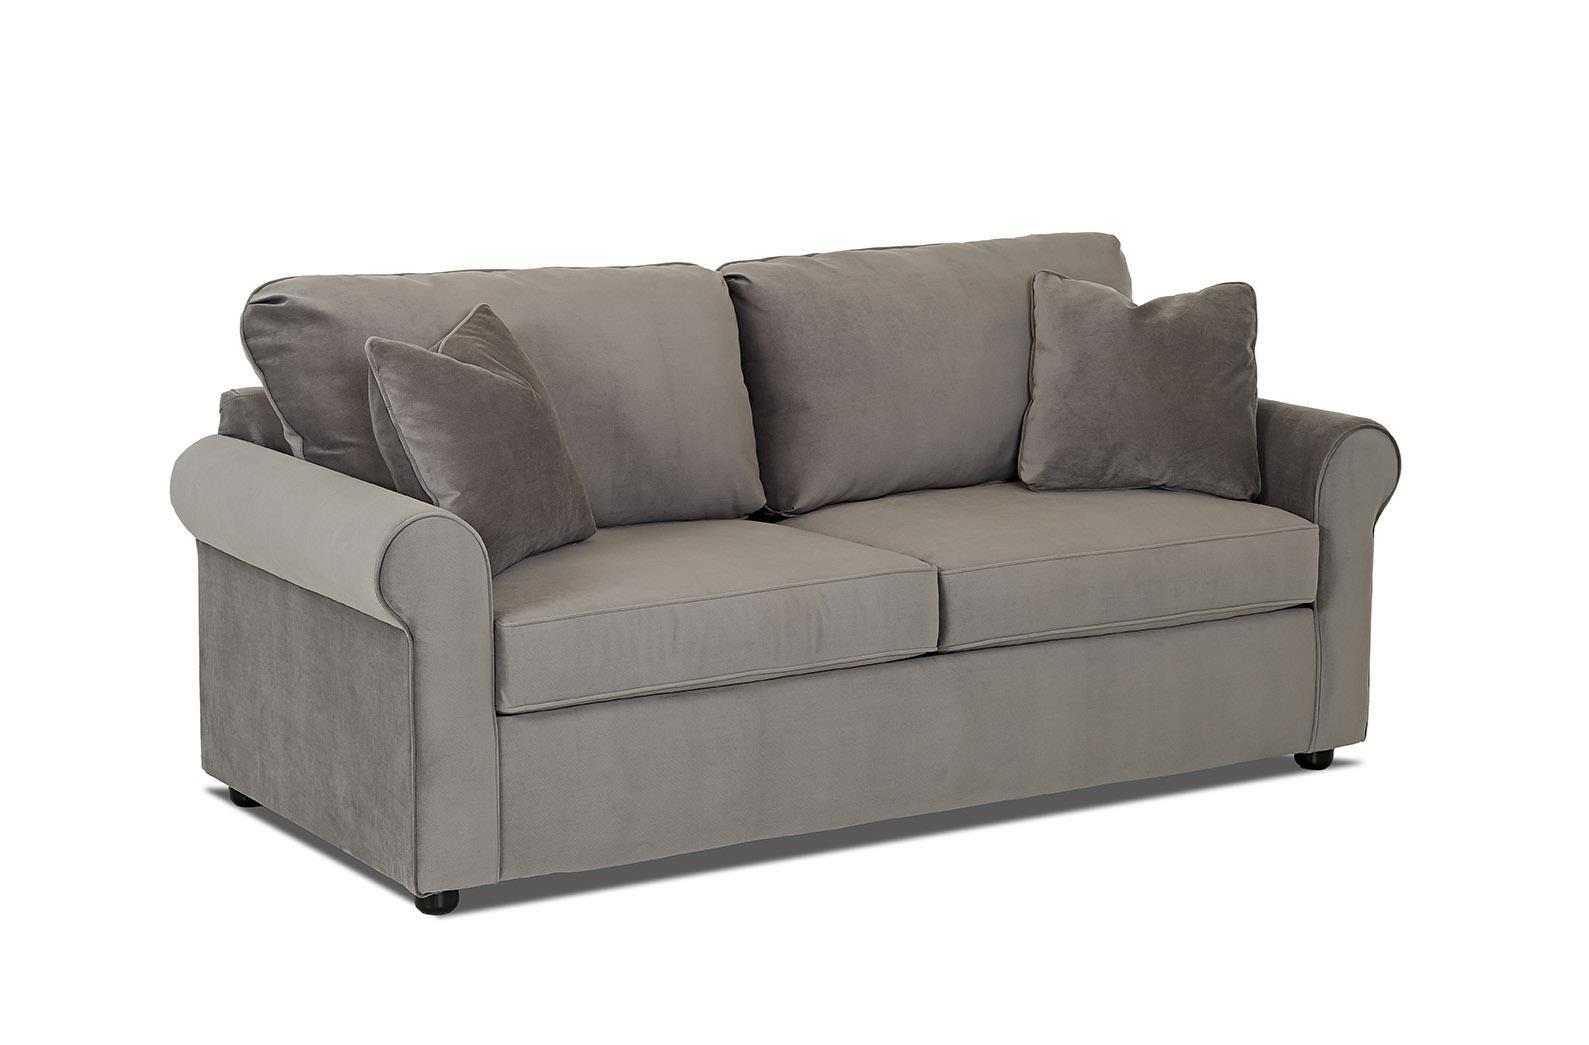 Sleeper sofas with memory foam mattresses - Metropia Babette Queen Sleeper Sofa With Memory Foam Mattress Item Number 152490 Eqsl